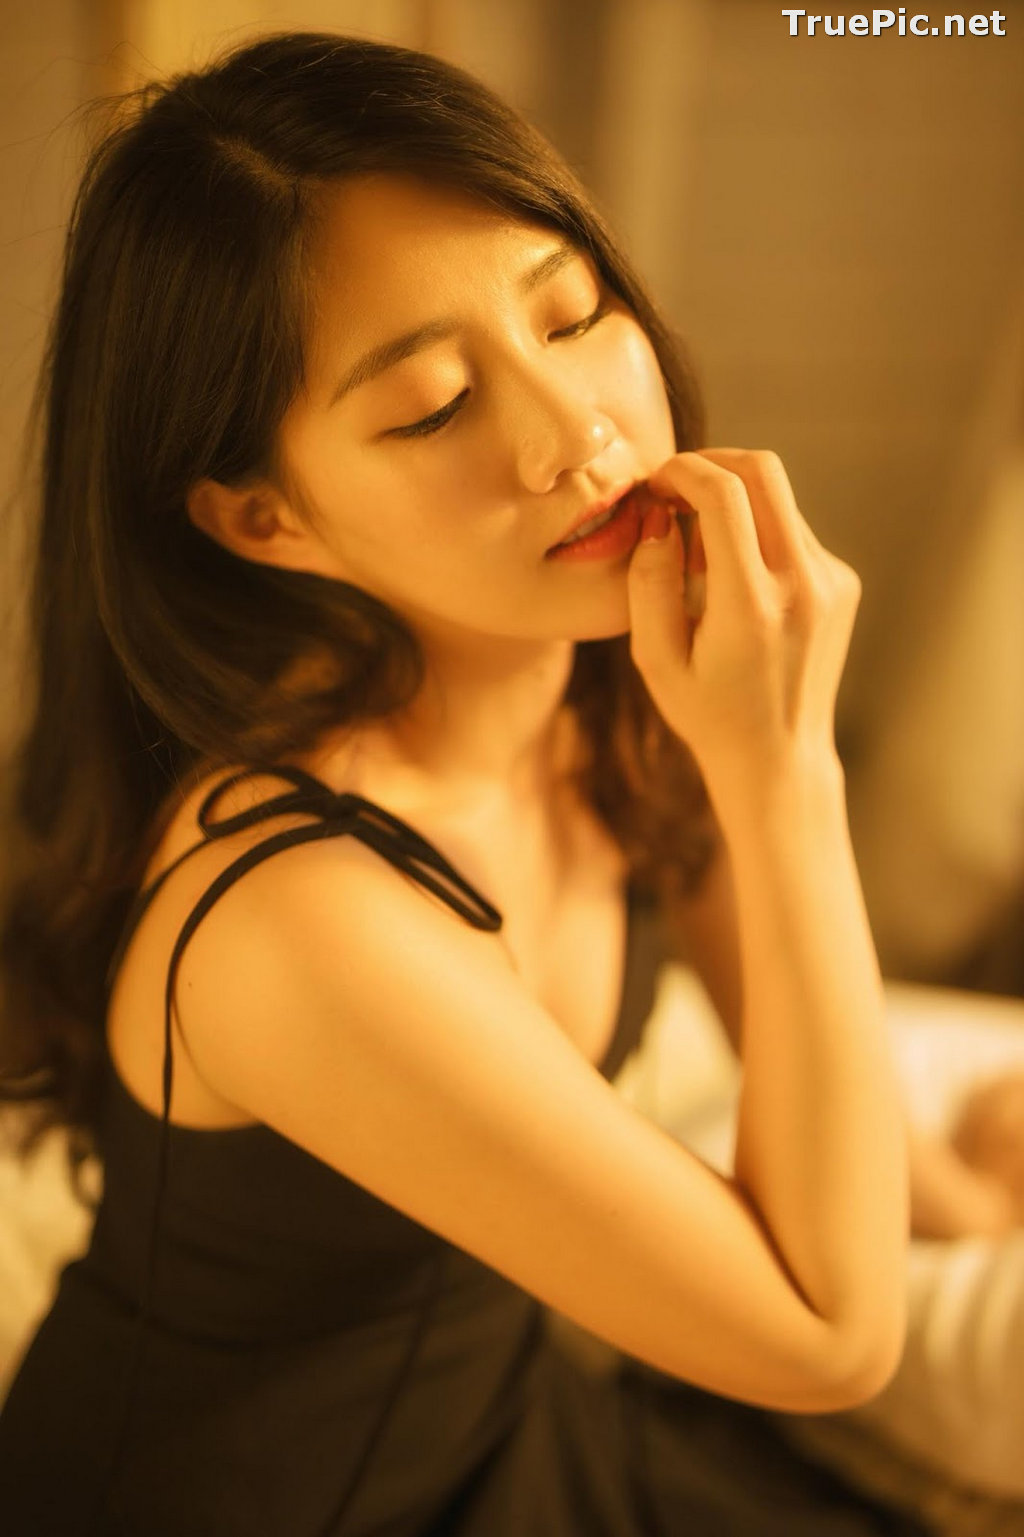 Image Vietnamese Hot Girl - Nguyen Hoang Kieu Trinh - My Black Angel - TruePic.net - Picture-10